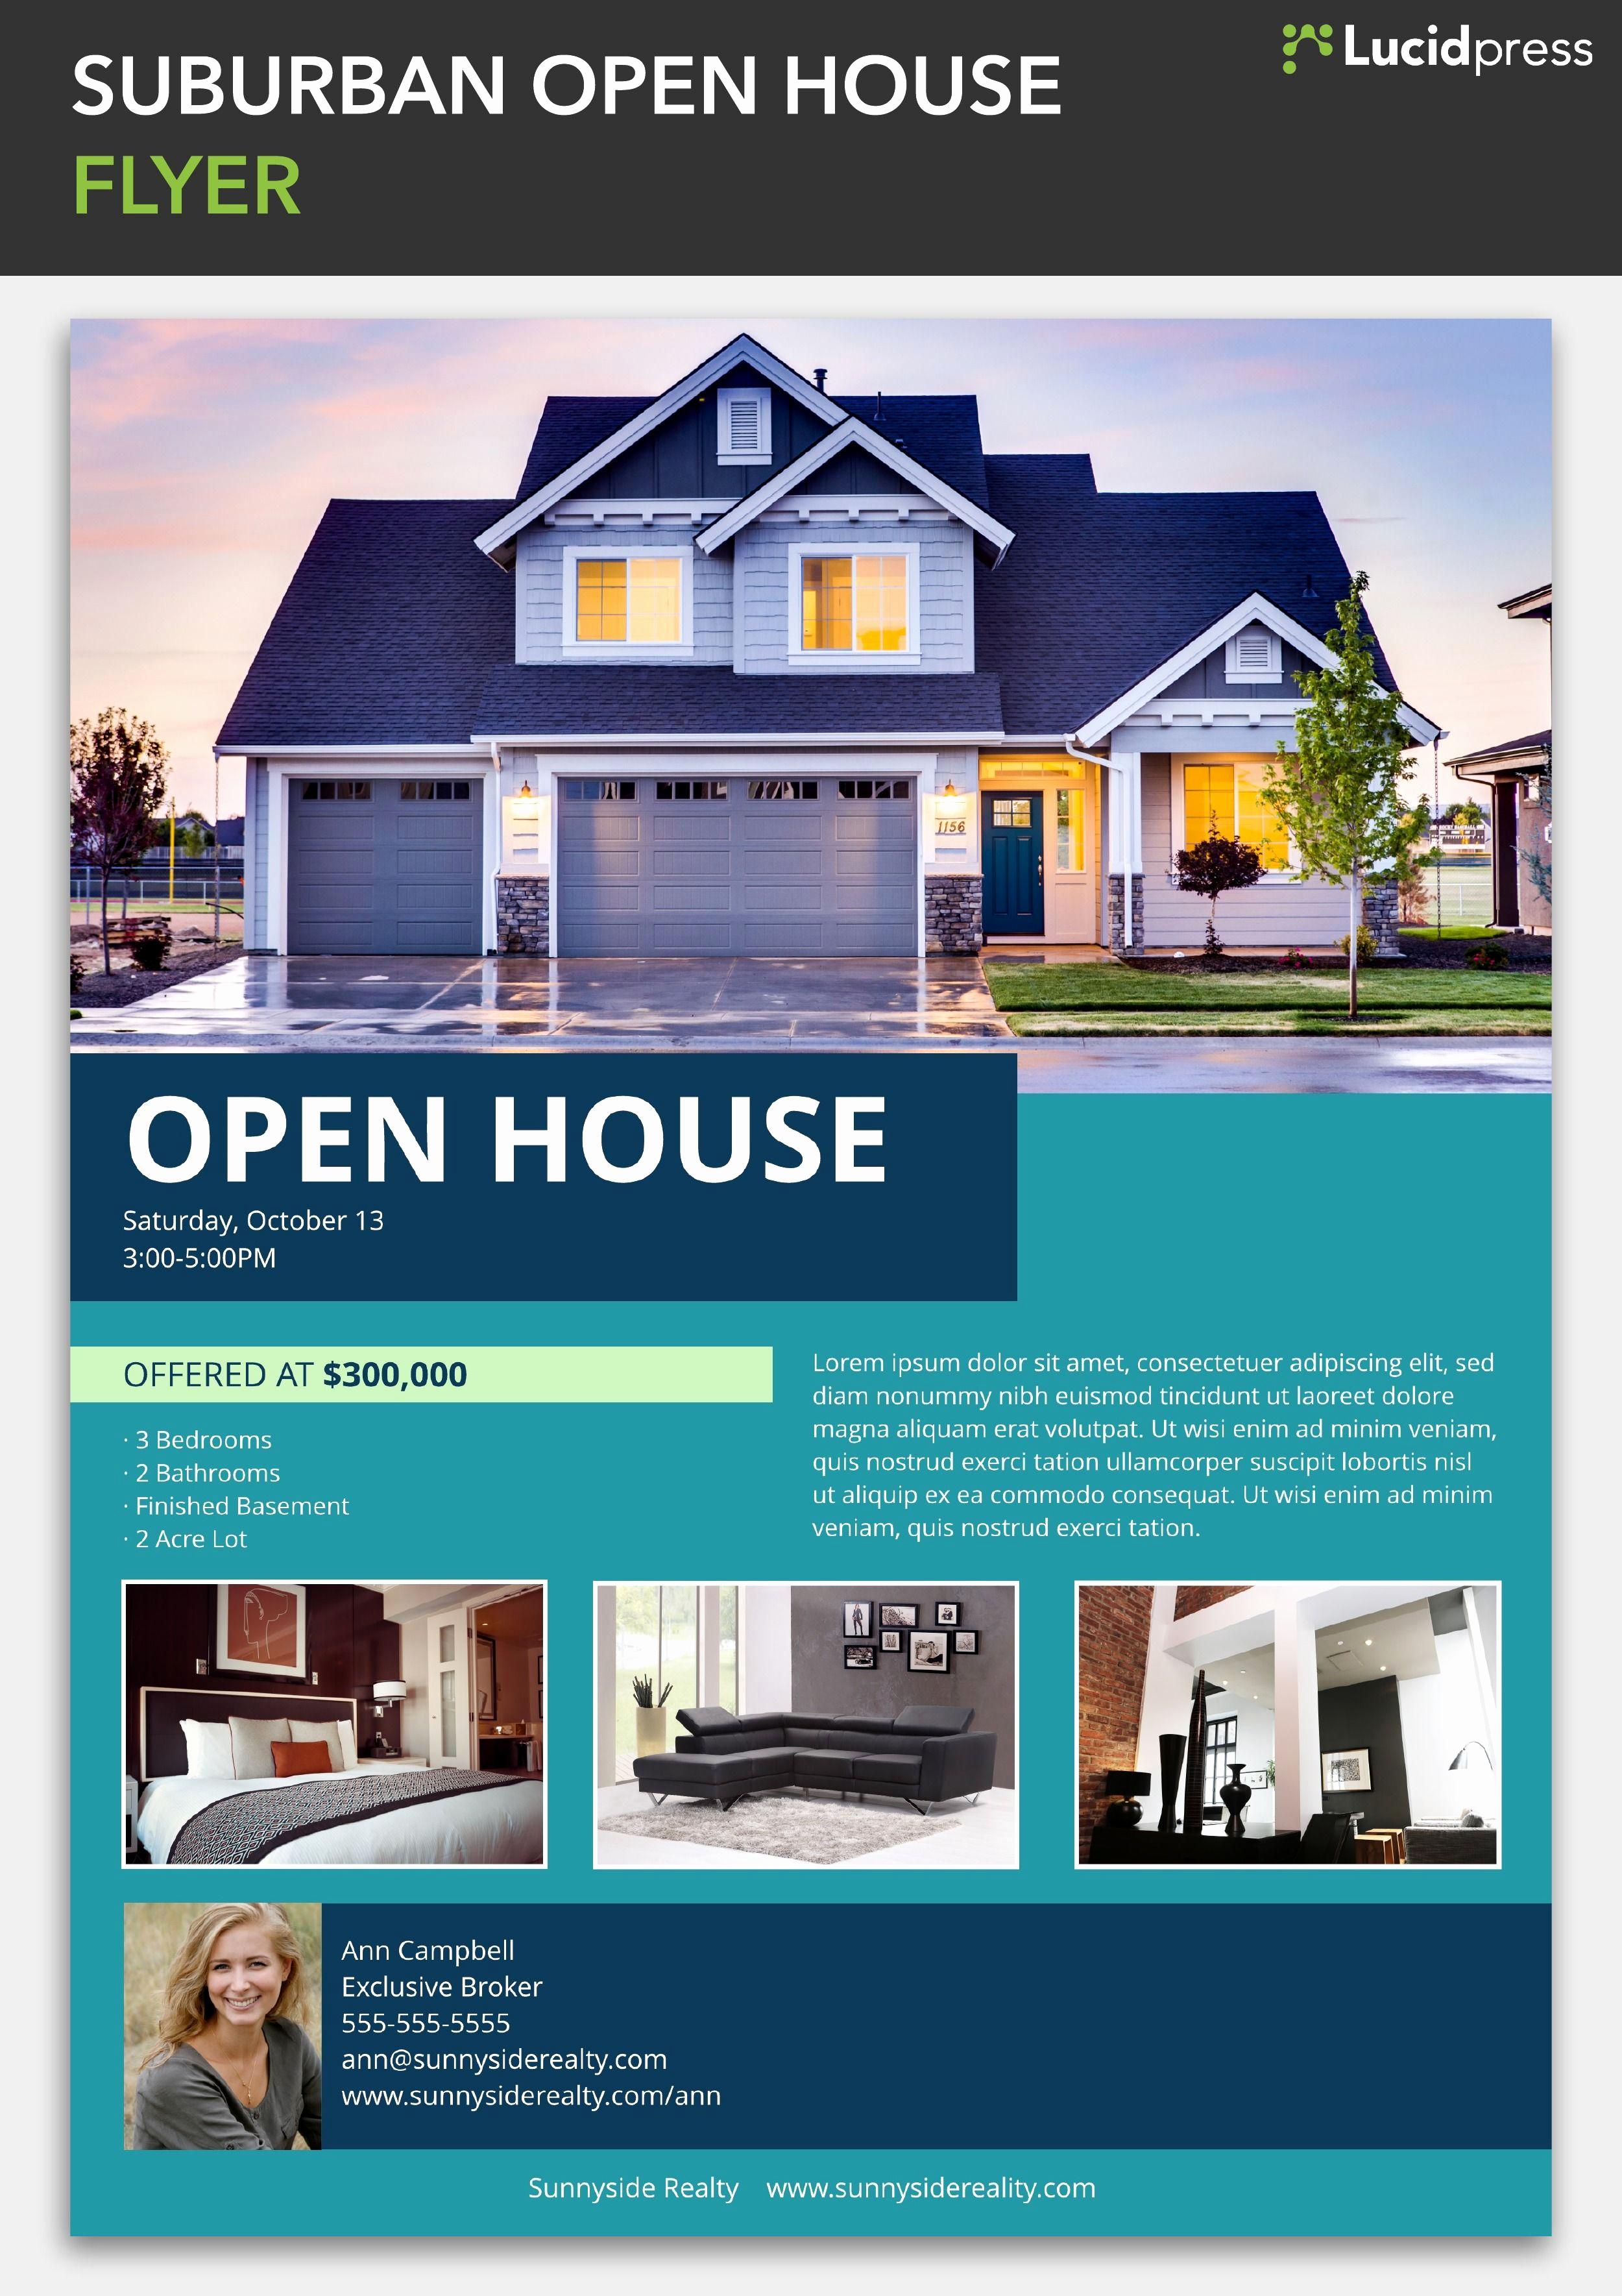 Open House Flyers Template Lovely Suburban Open House Flyer Template